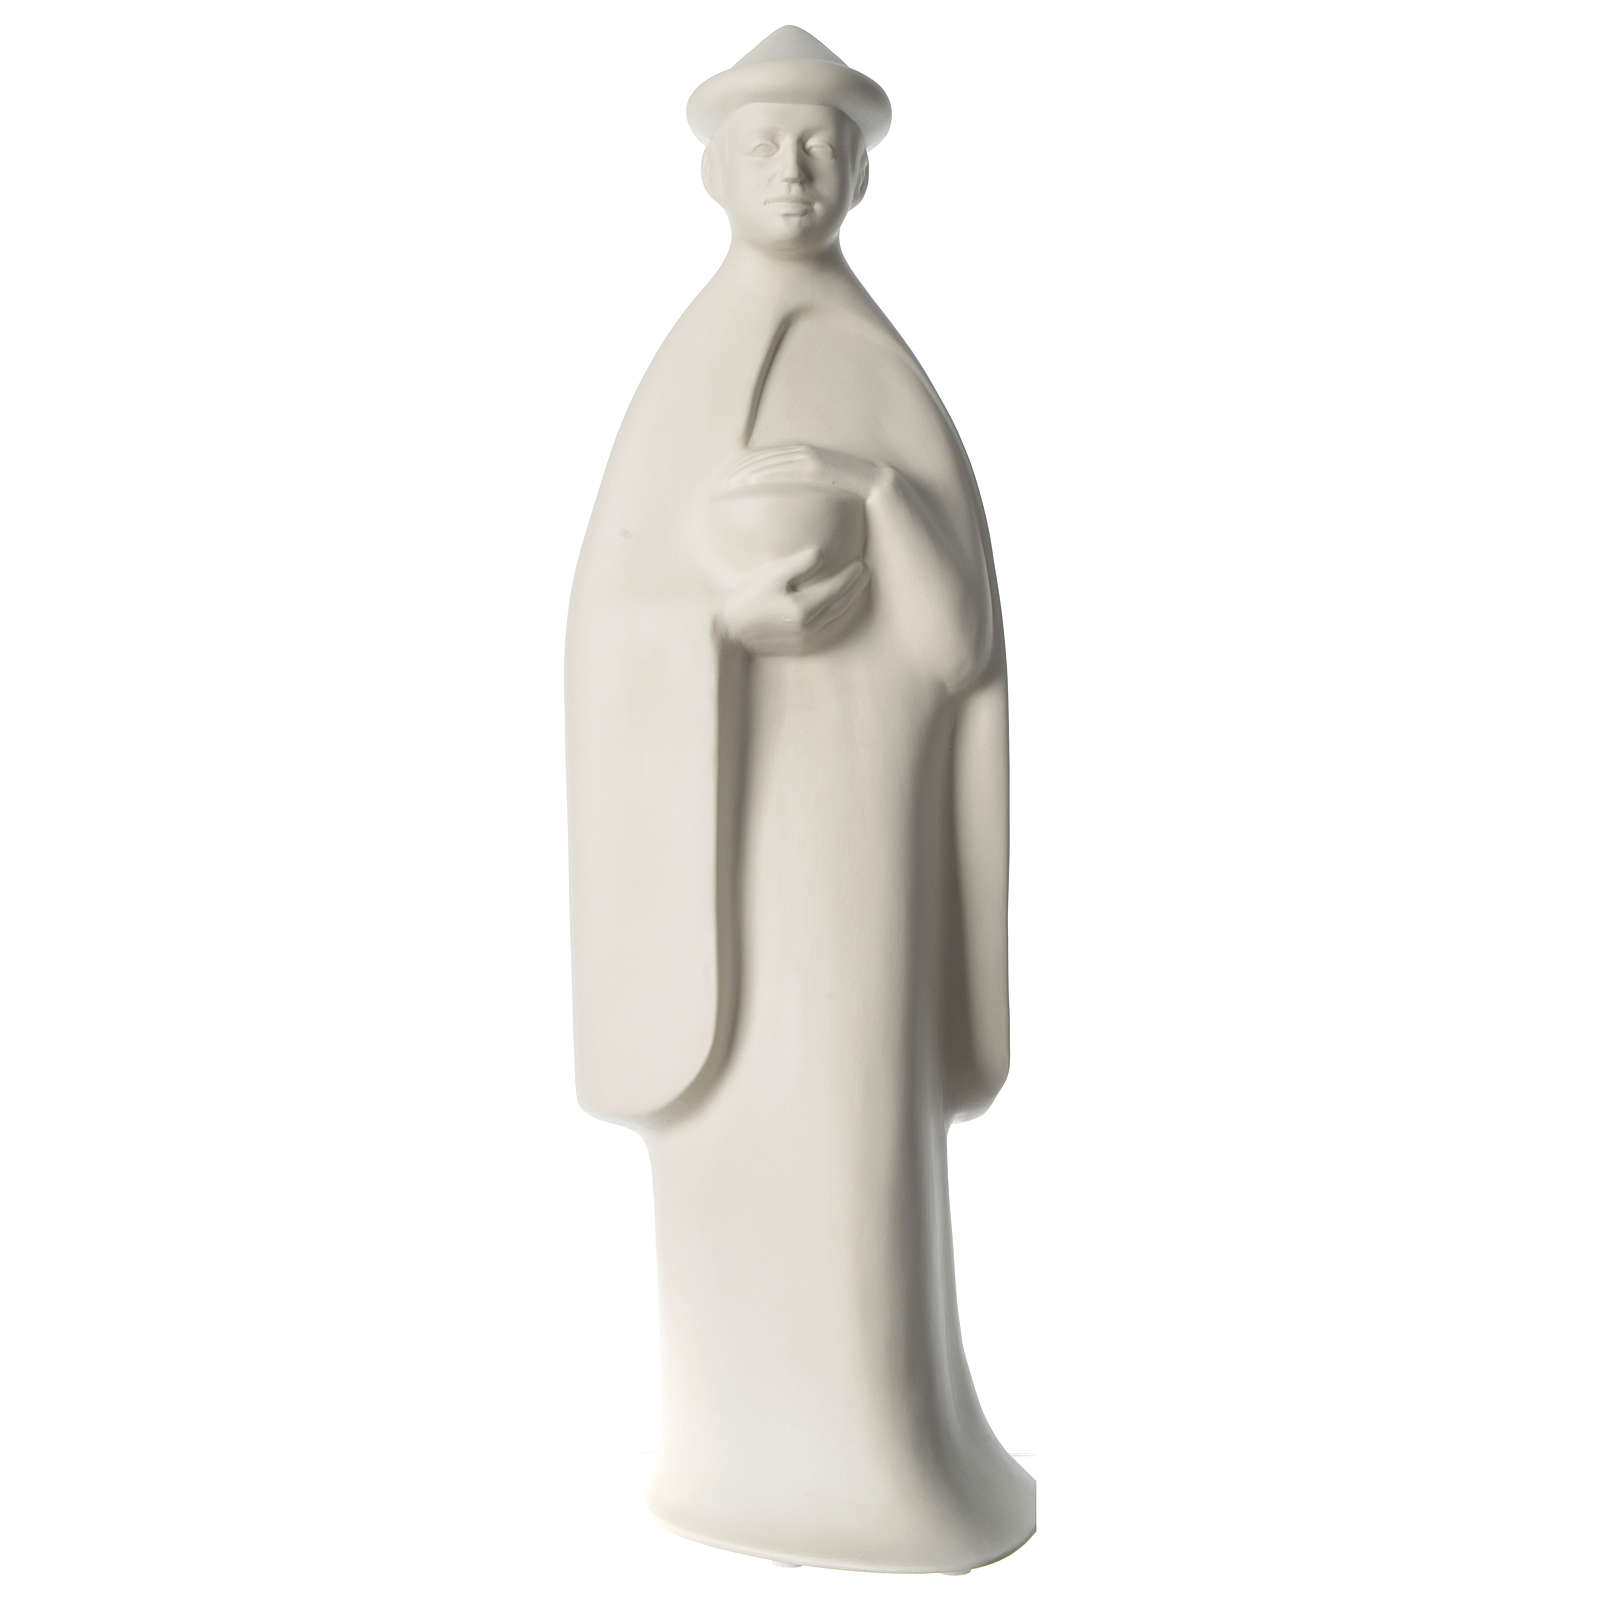 Rey de pie porcelana para belén 55 cm de altura media Francesco Pinton 4